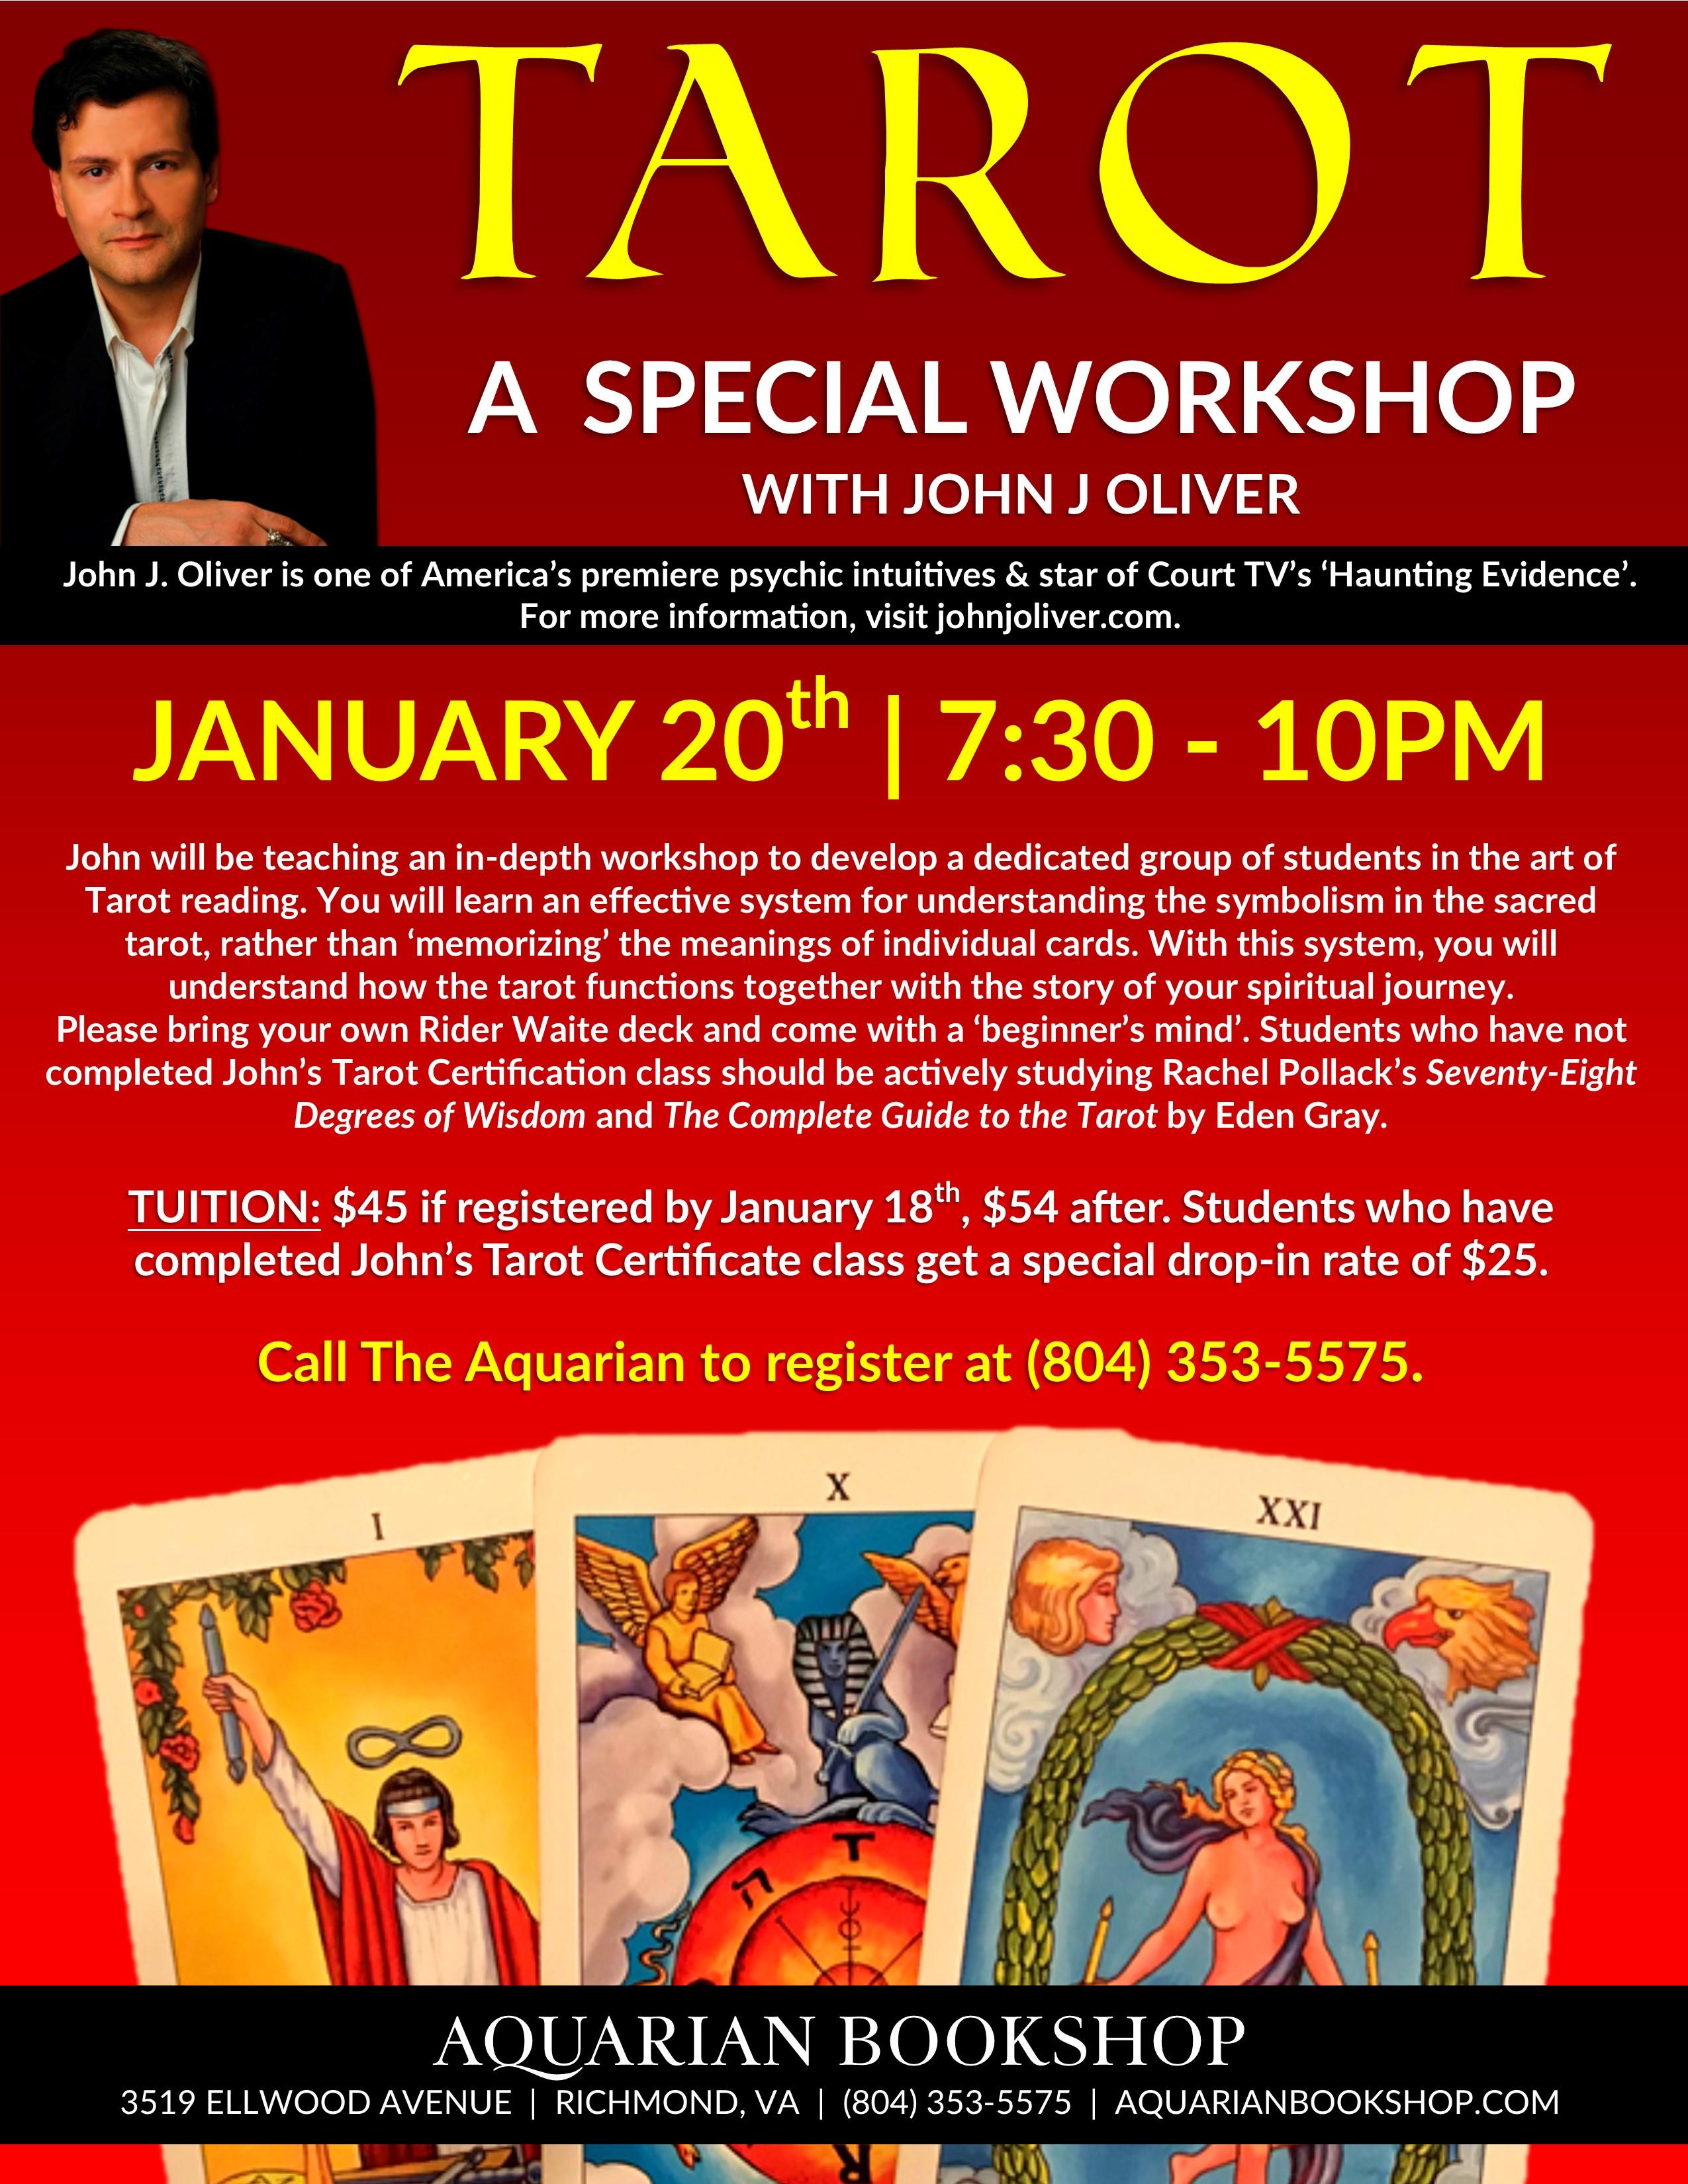 Tarot Workshop with John J Oliver January 20th 7:30-10PM